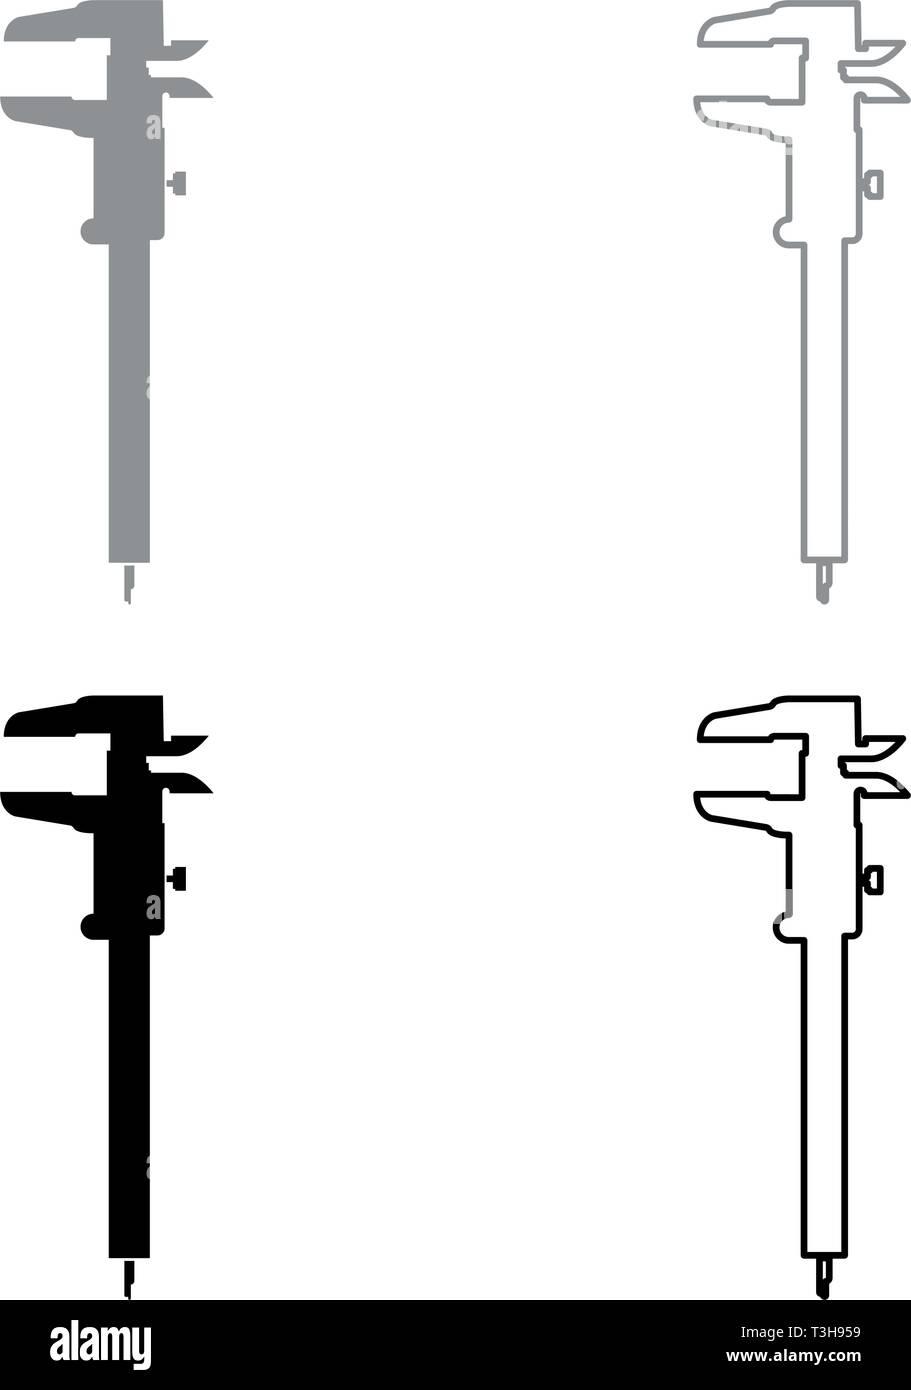 medium resolution of caliper hand caliper sliding caliper vernier caliper caliper gage slide gage trammel icon set black grey